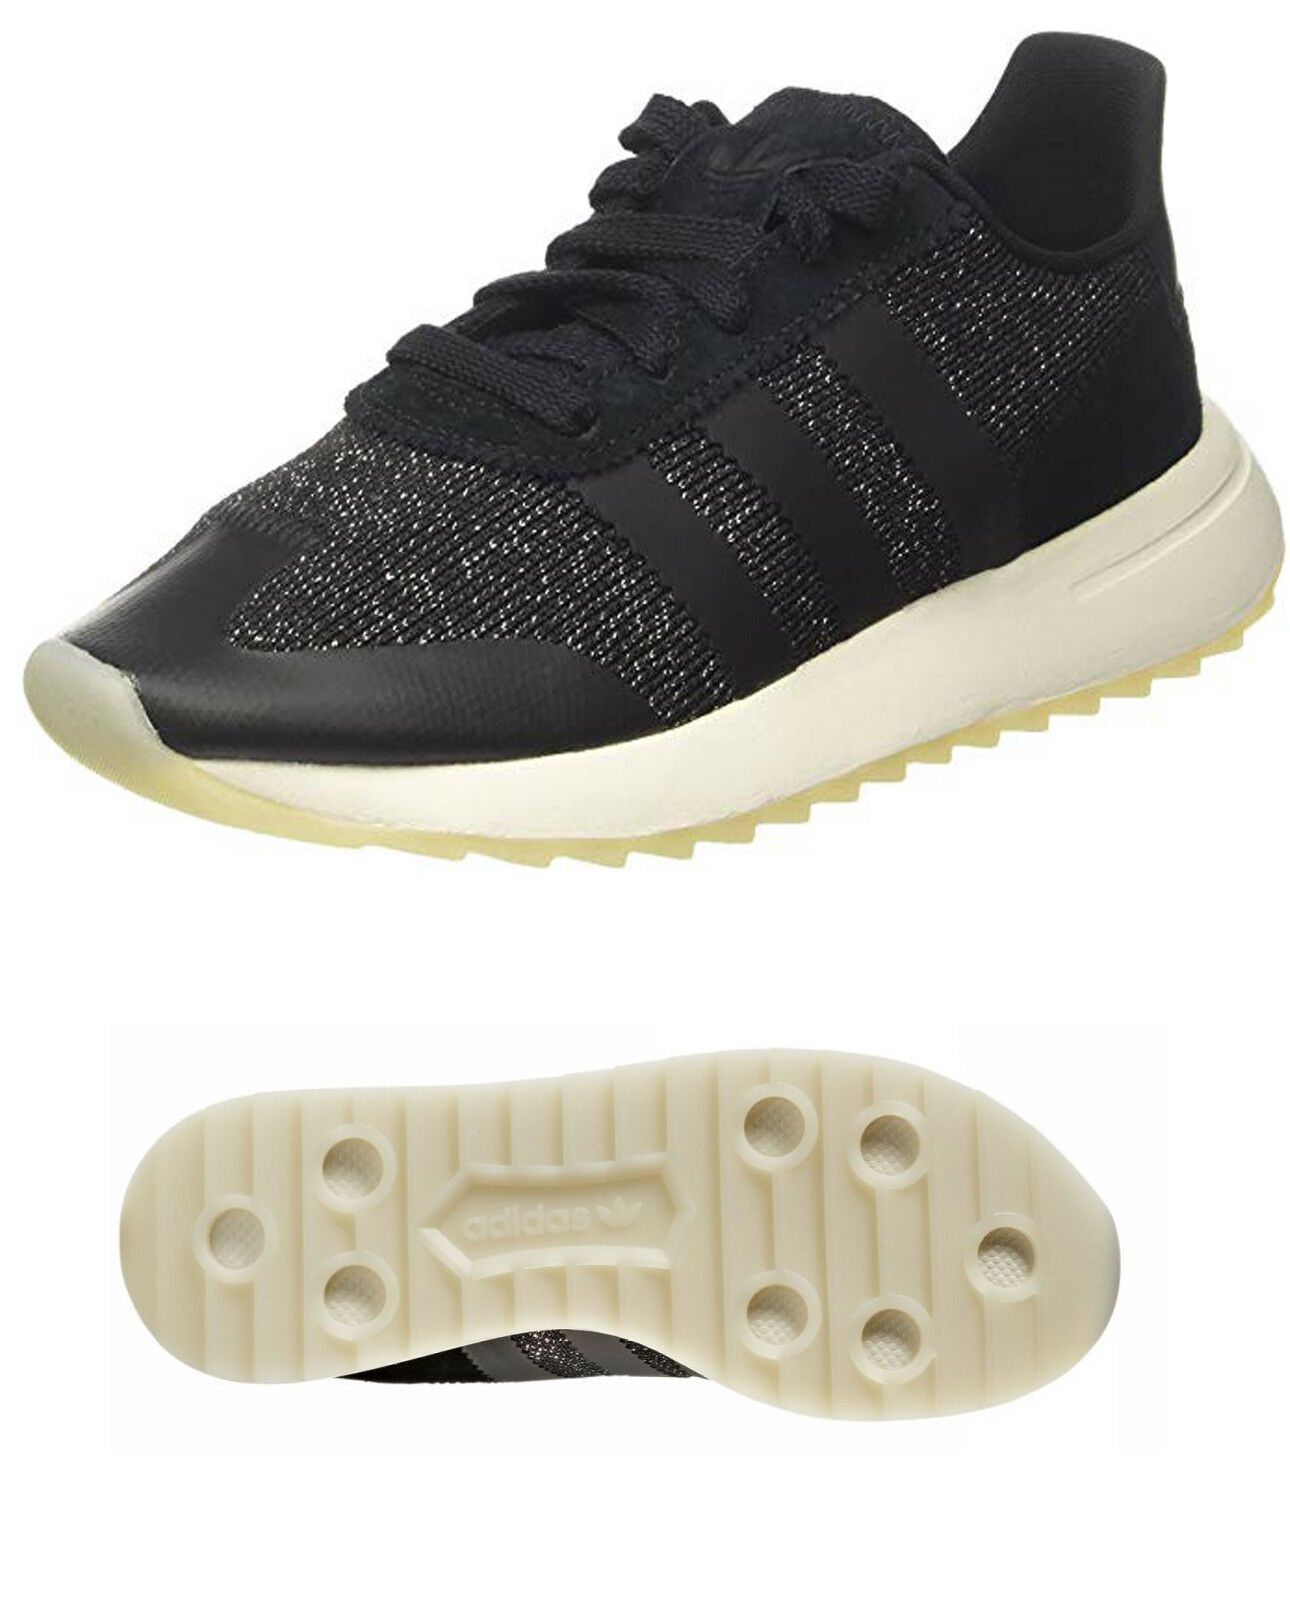 Adidas Originals by9687 FLB W Chaussures de Course baskets Noir